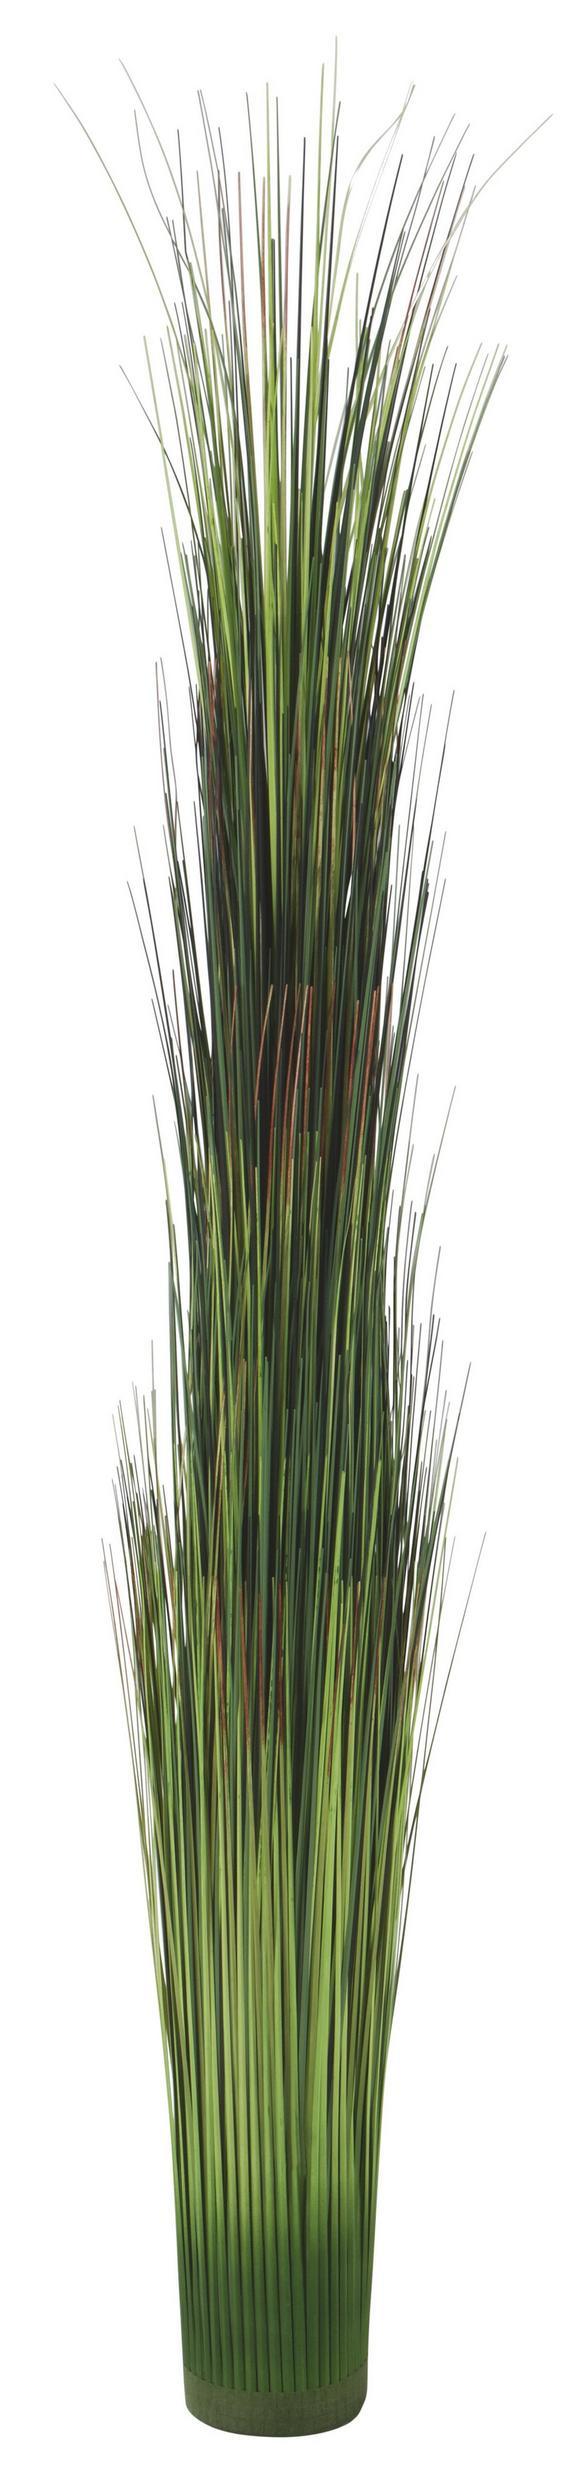 Grasbündel Markus Grün - Grün, Kunststoff (120cm)